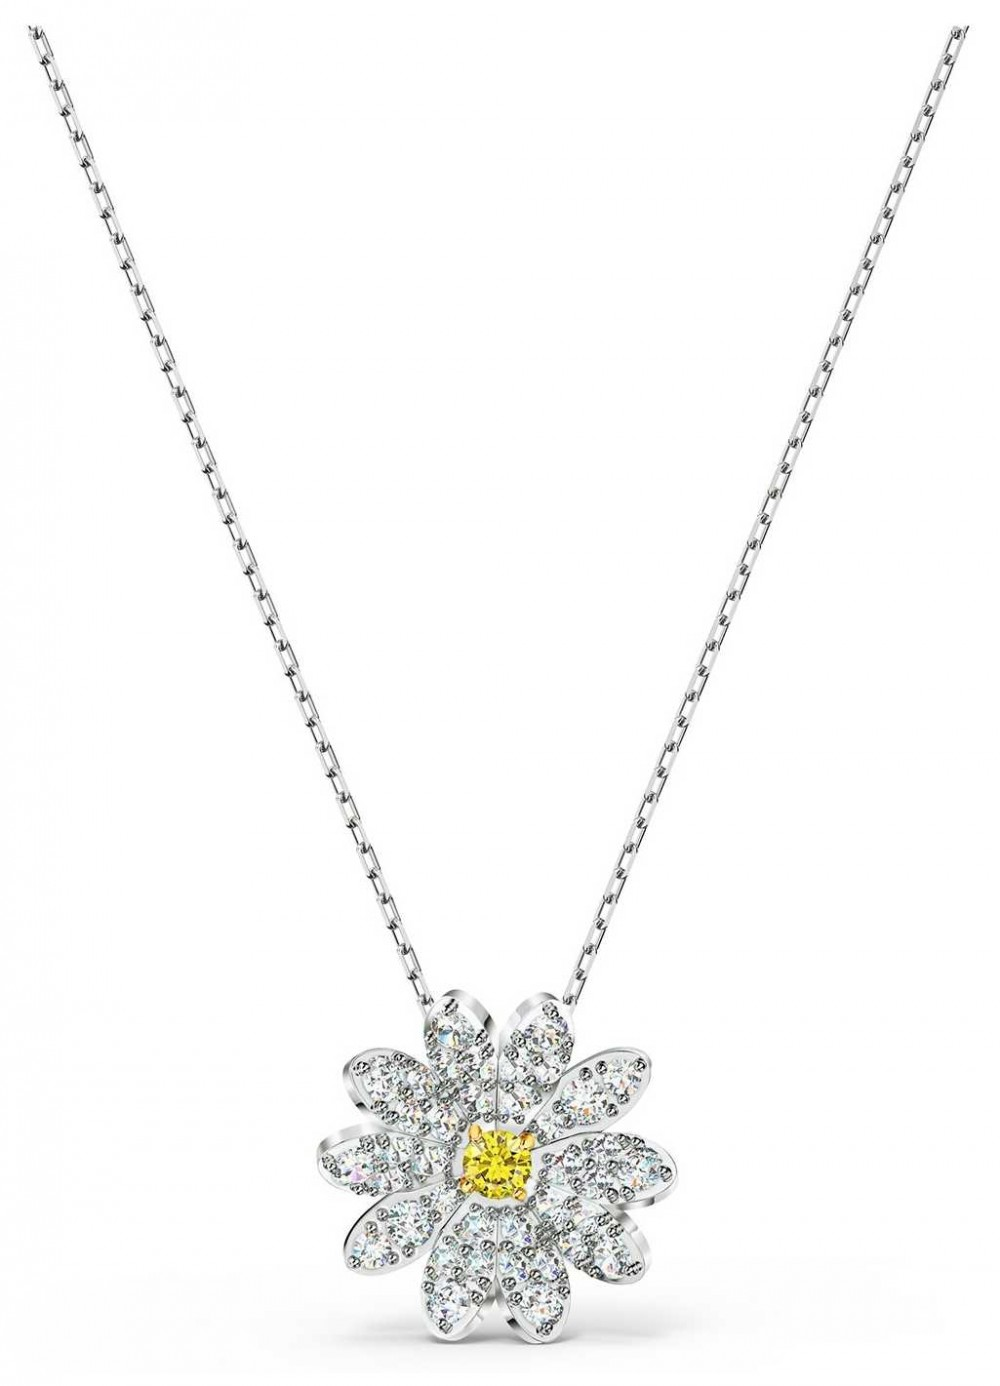 Swarovski | Eternal | Flower Pendant Necklace | Yellow | Mixed Metal 5512662